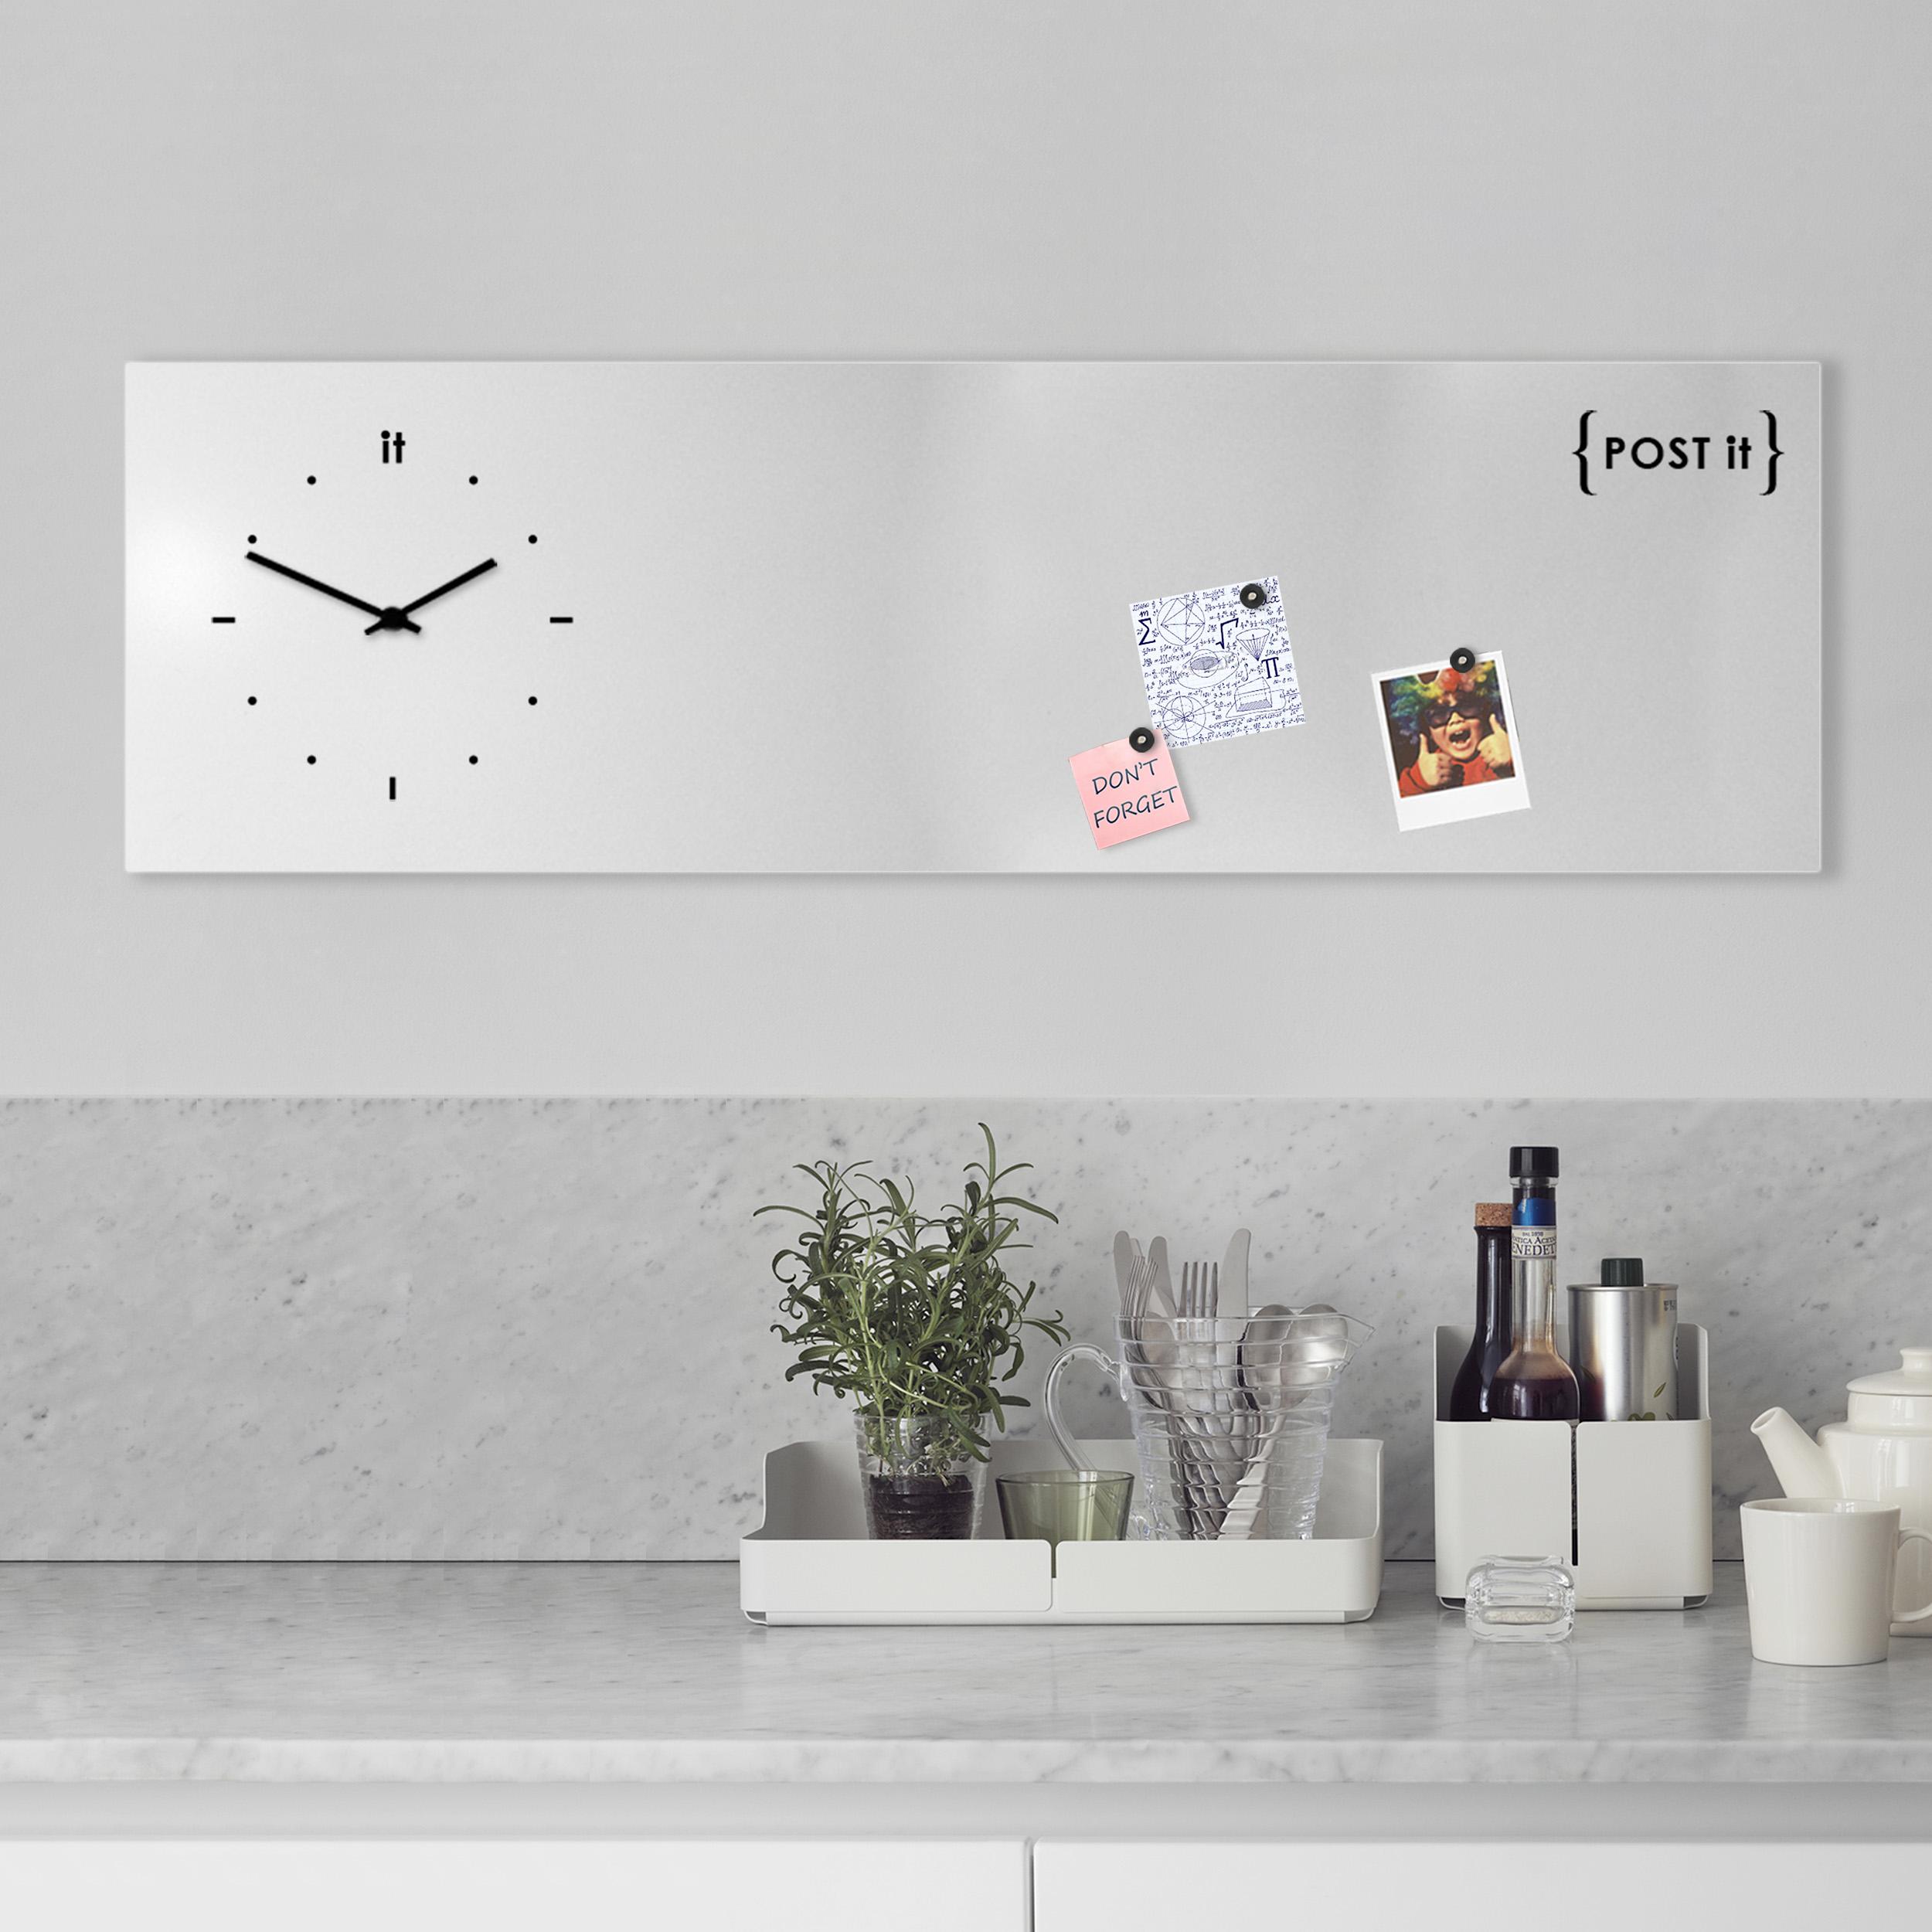 Orologio di design lavagna magnetica post it designobject - Lavagna cucina design ...